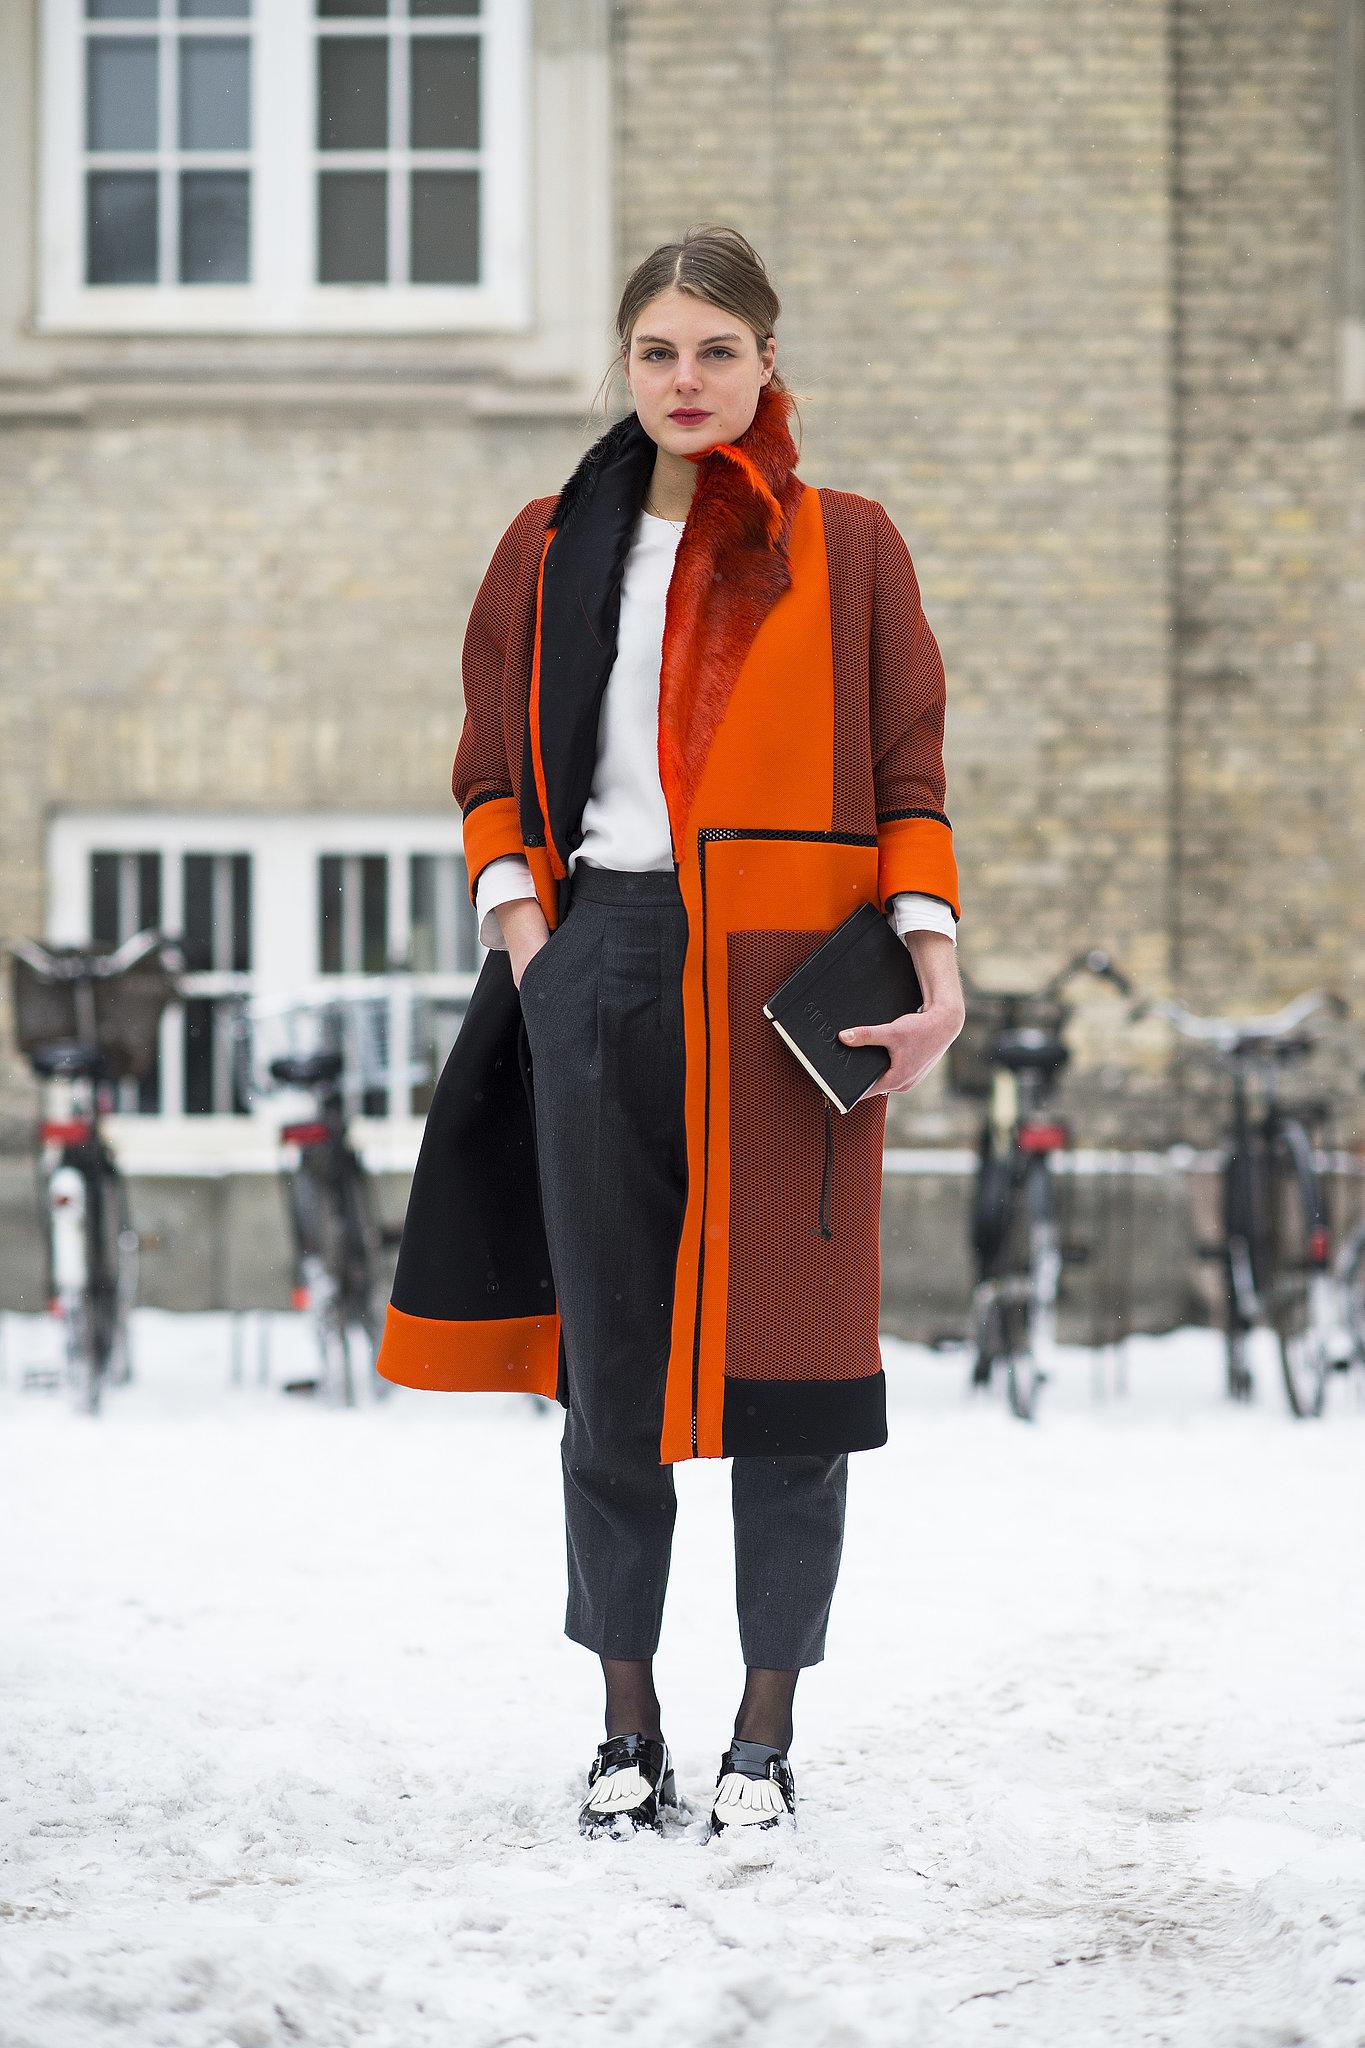 Orange you glad she added some wow-factor color? Source: Le 21ème   Adam Katz Sinding